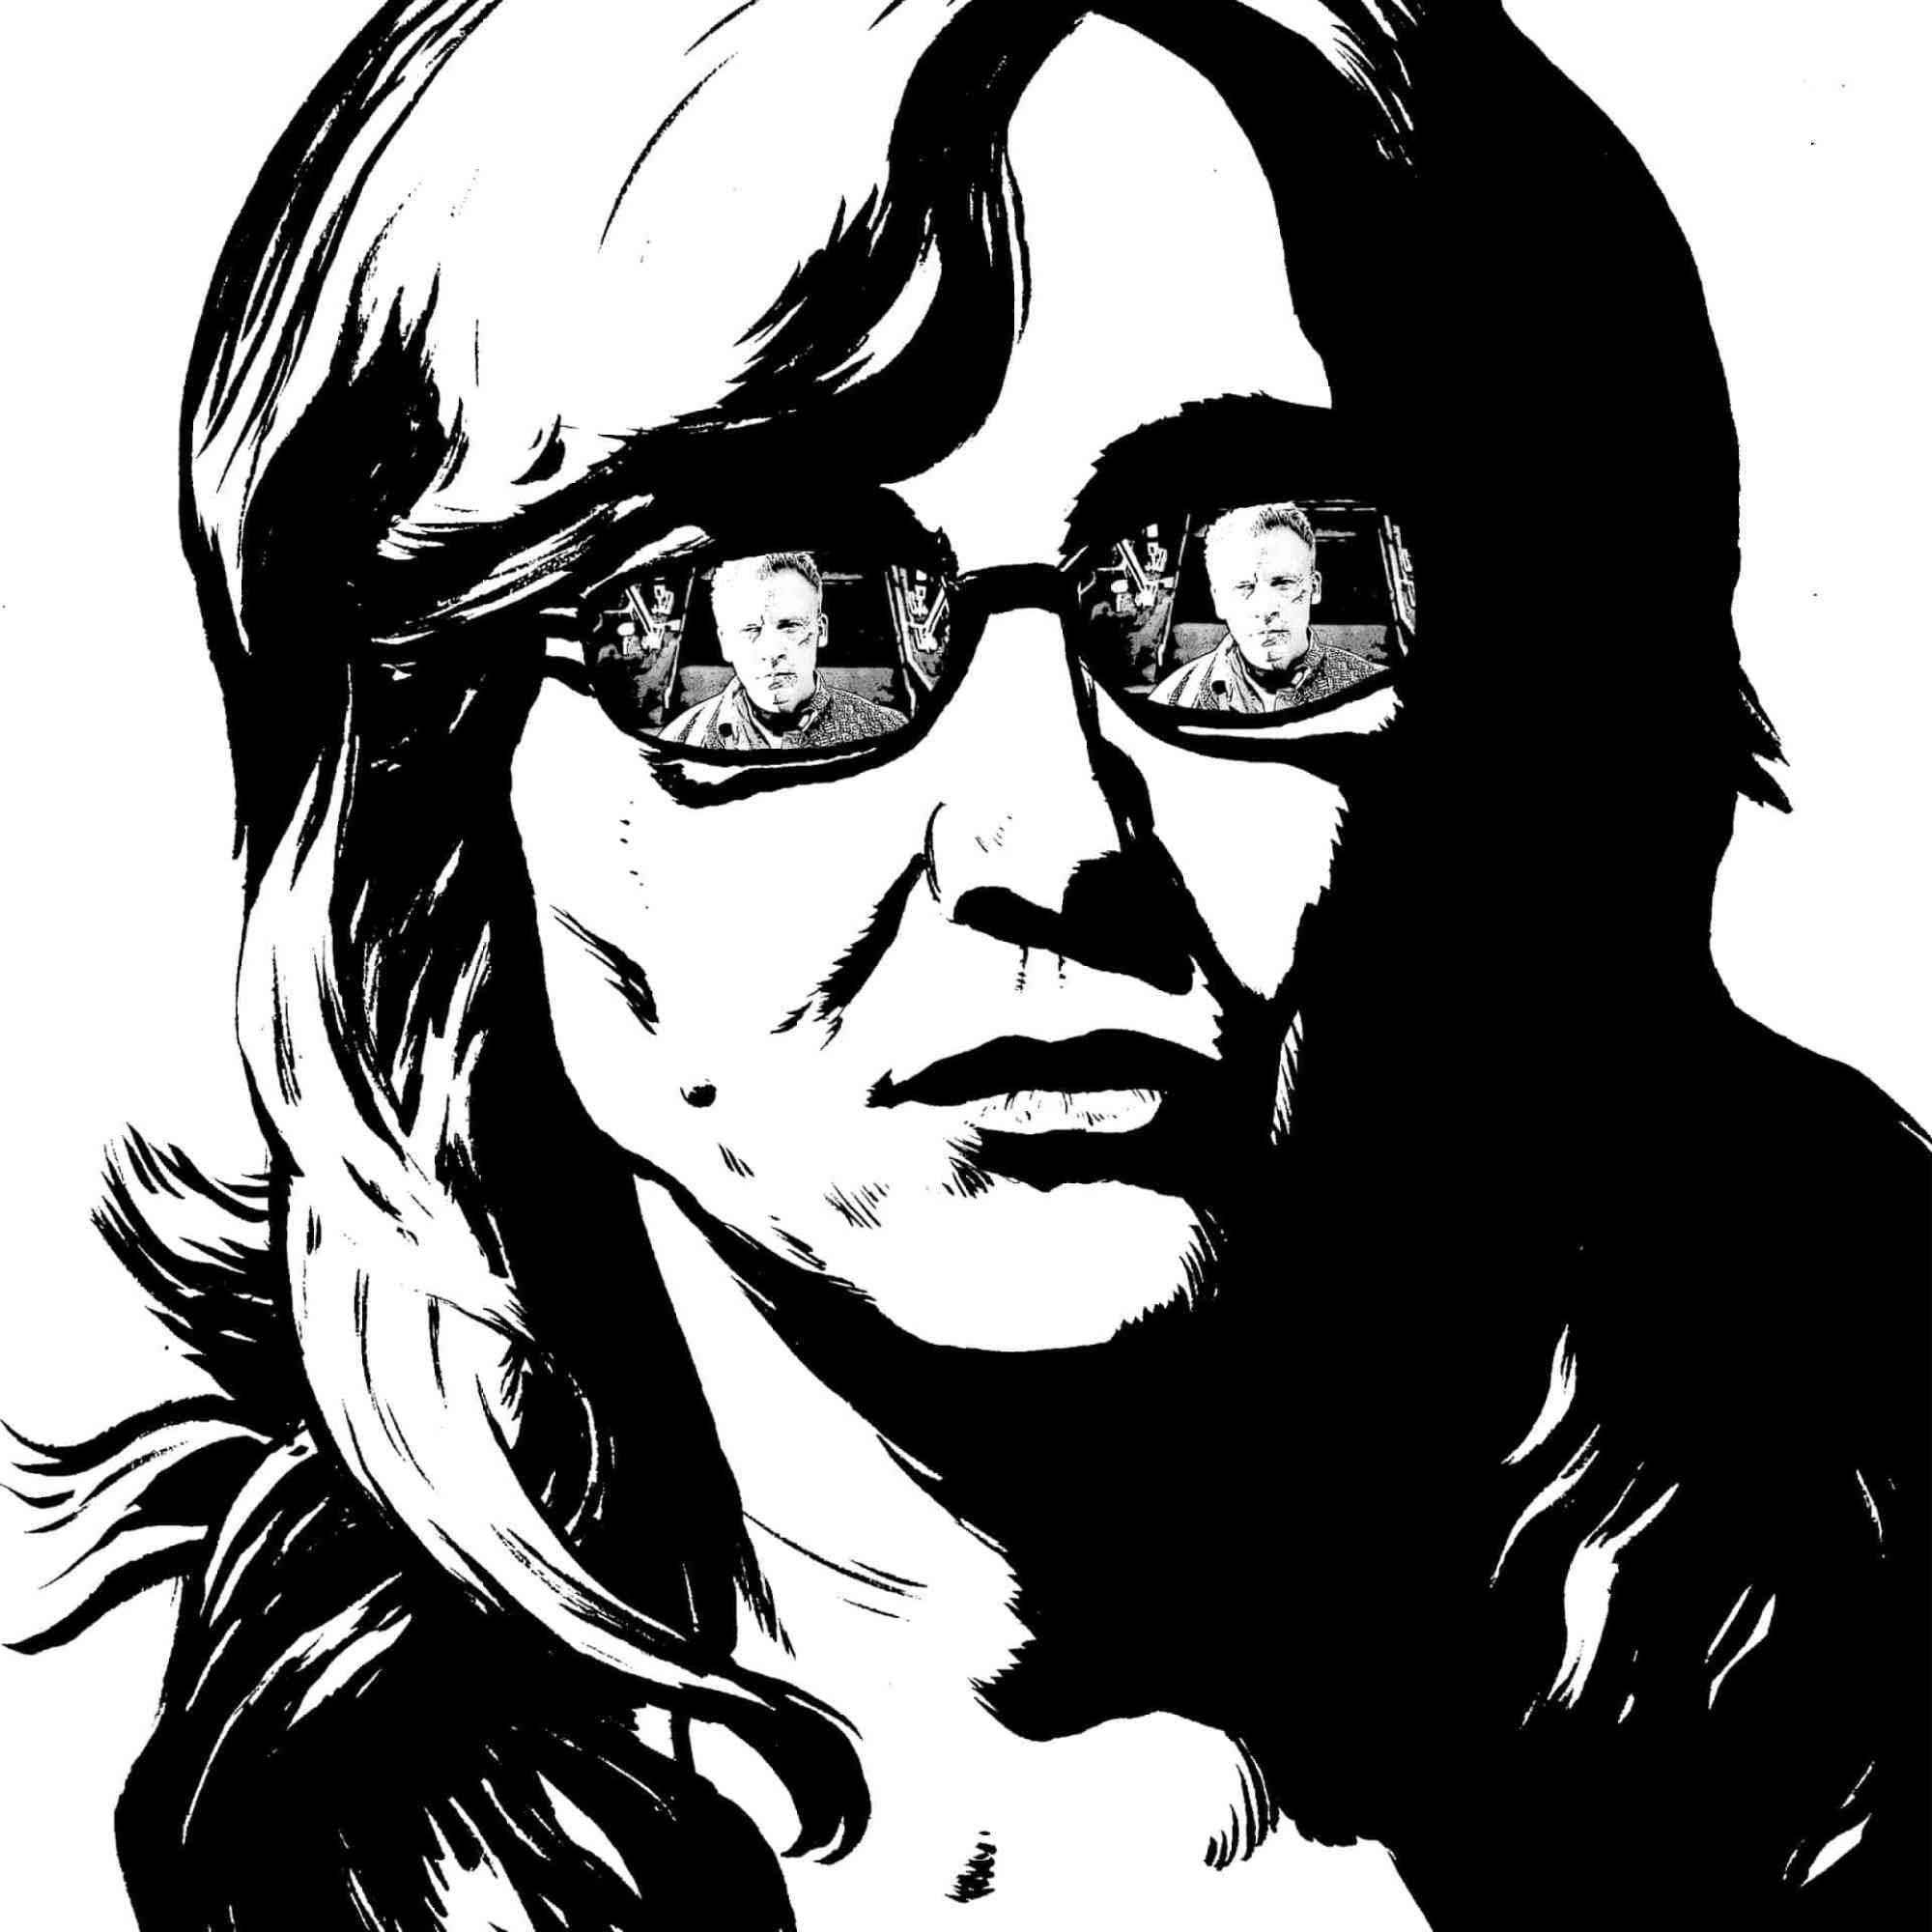 Hall of Faces - Laura Roslin (Mary McDonnell), Battlestar Galactica